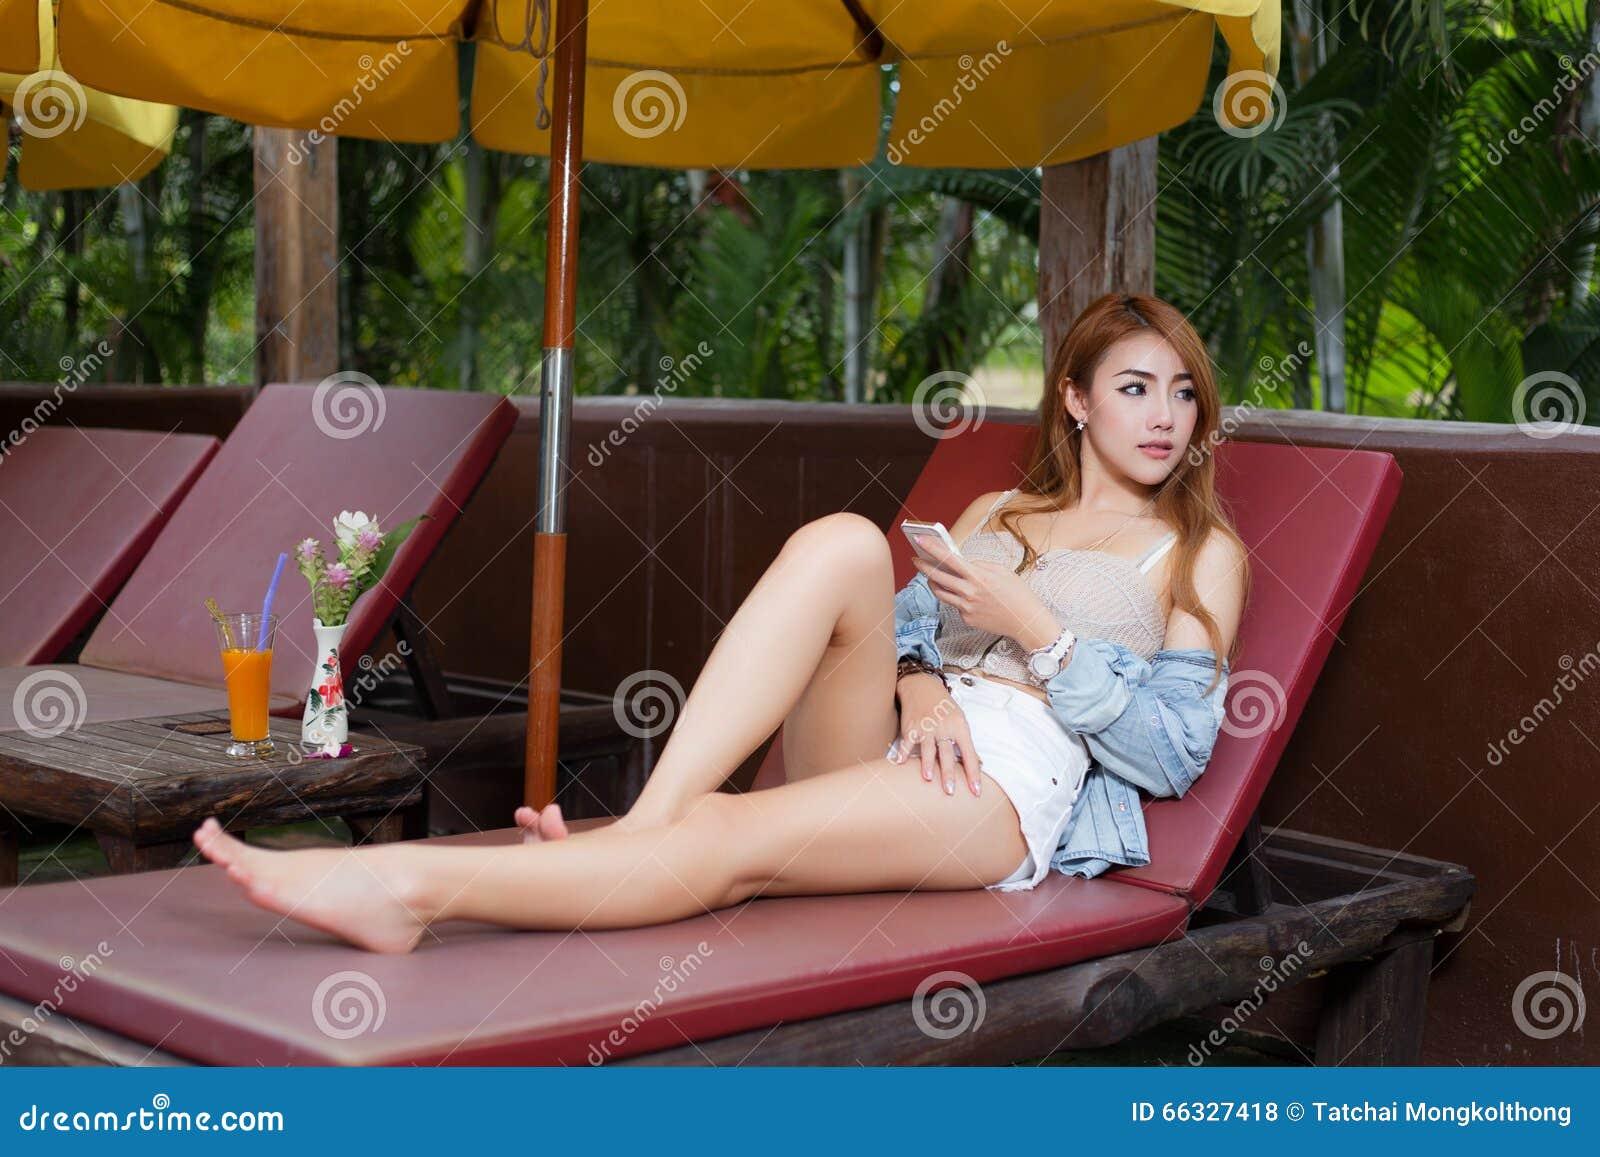 Beautiful girl browsing internet in a smartphone